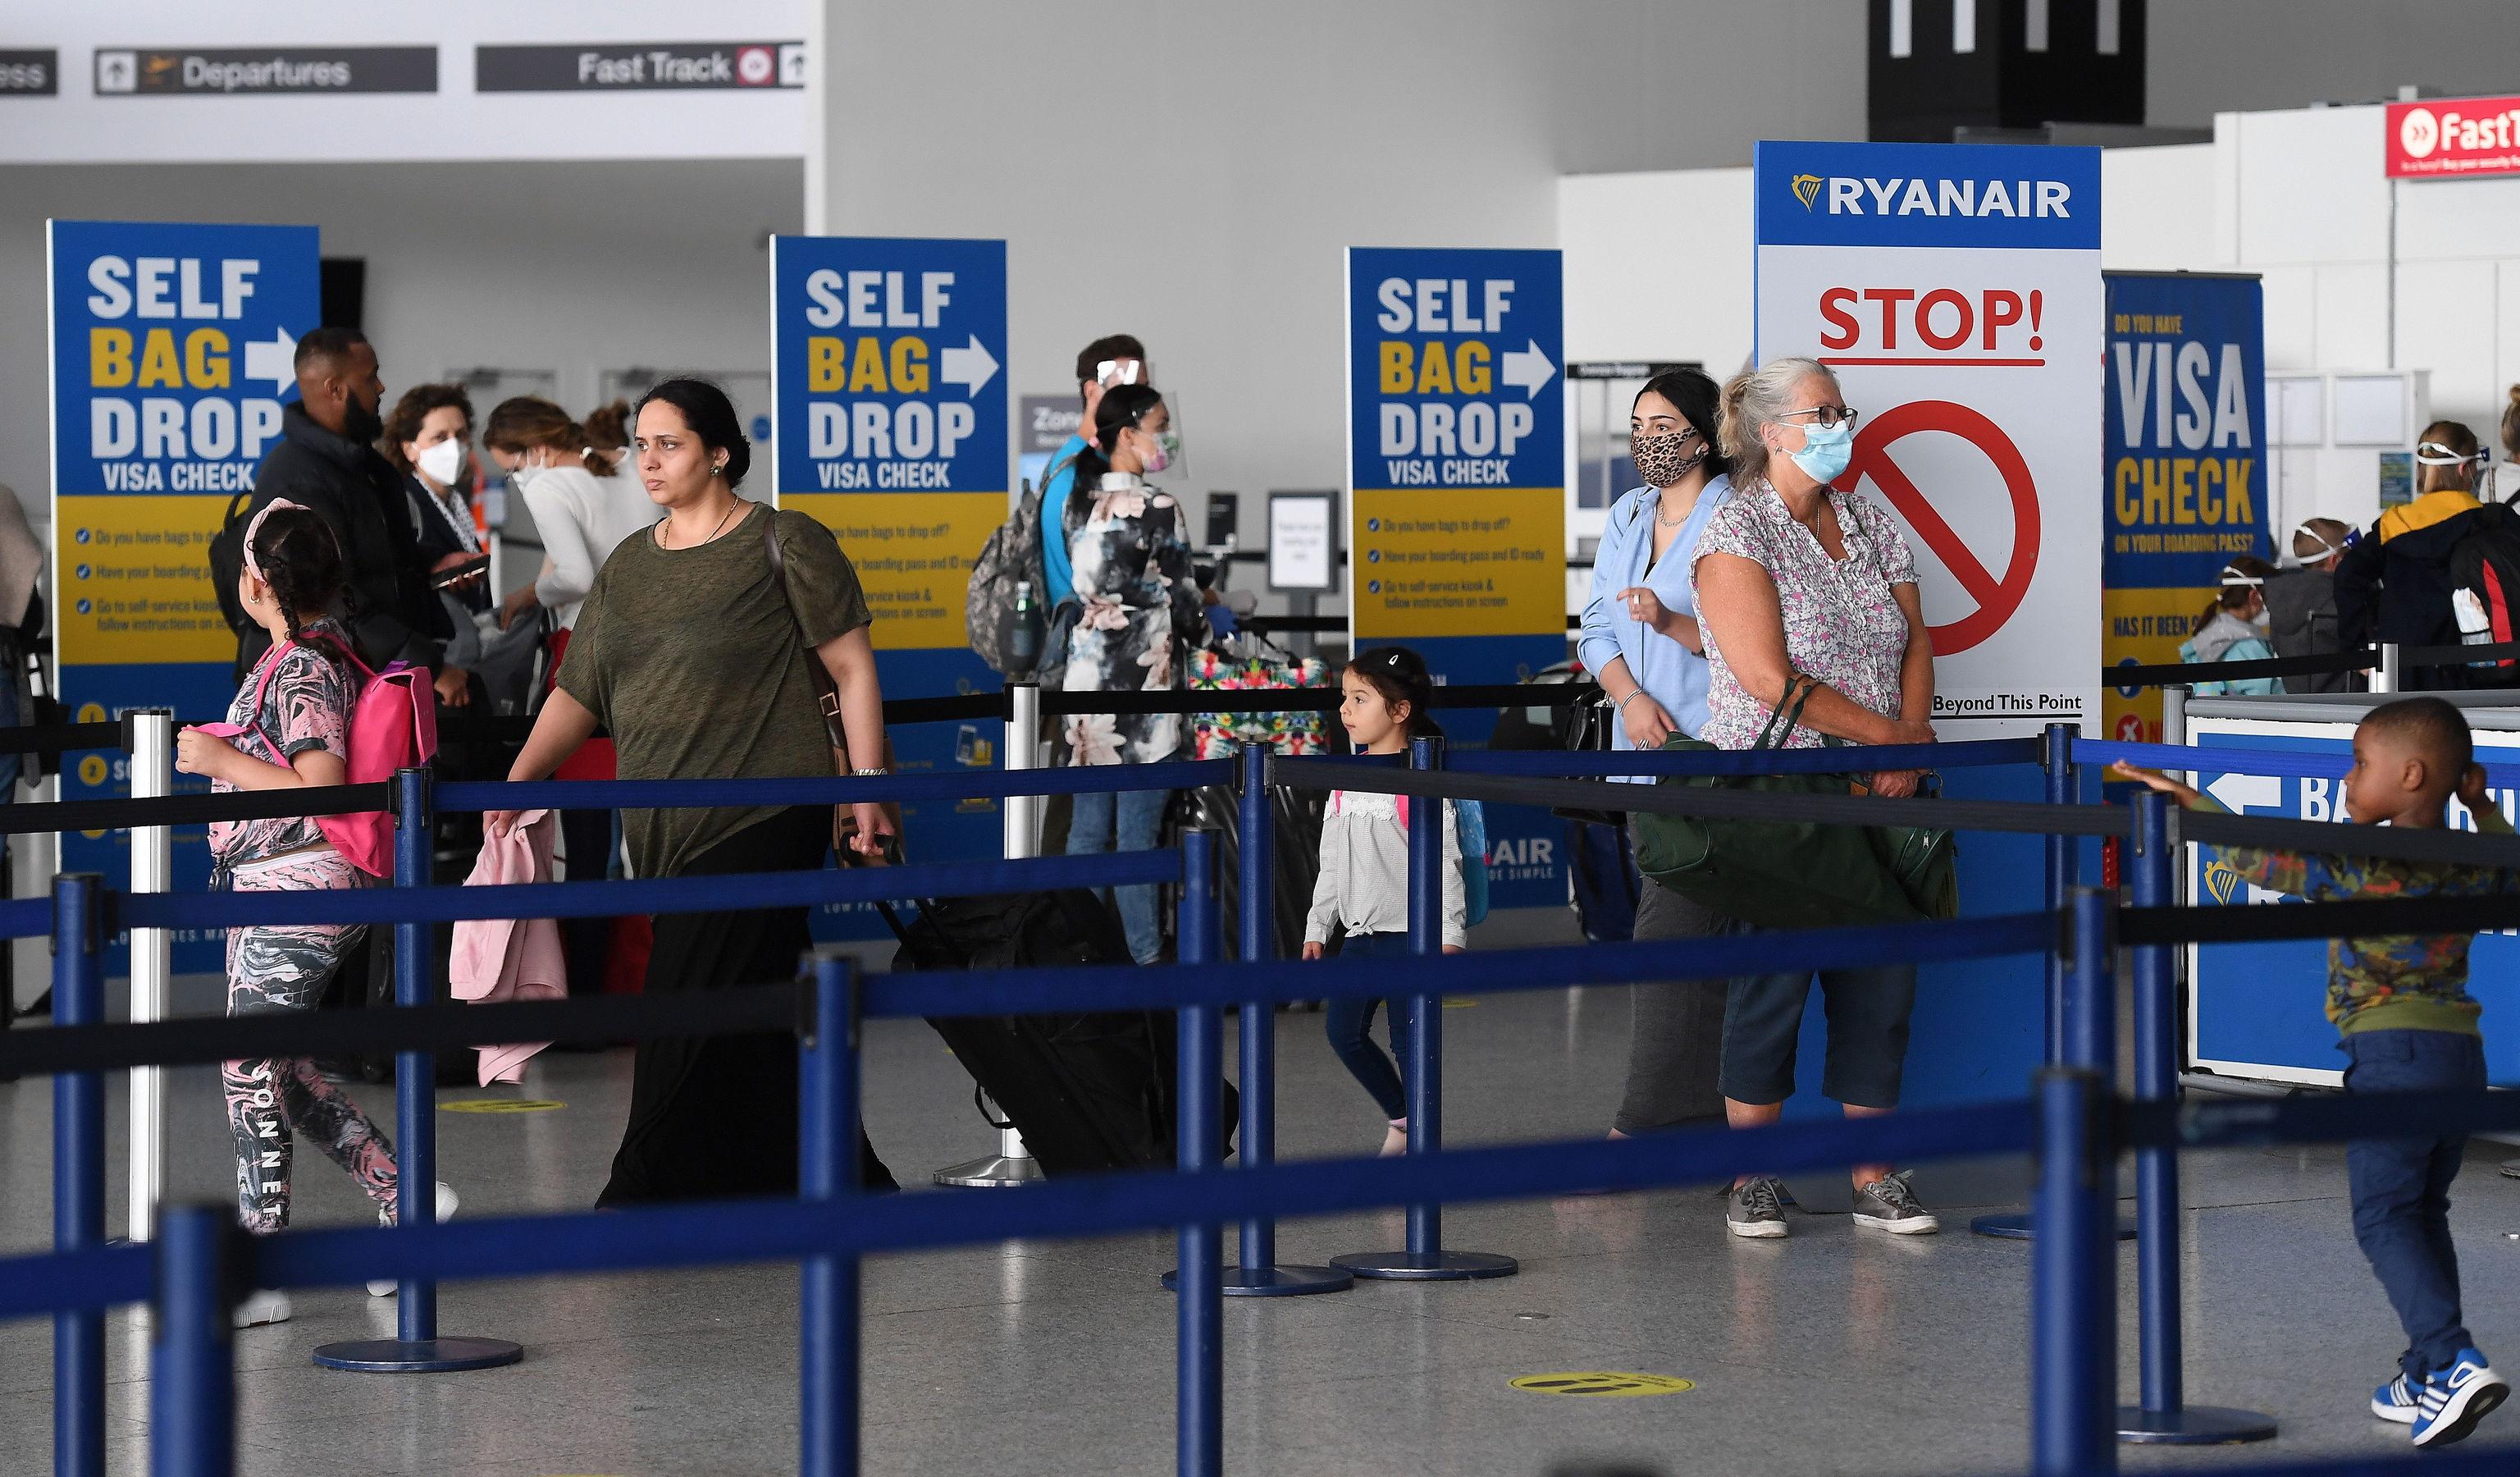 Aeropuerto londinense de Stansted, Gran Bretaña.